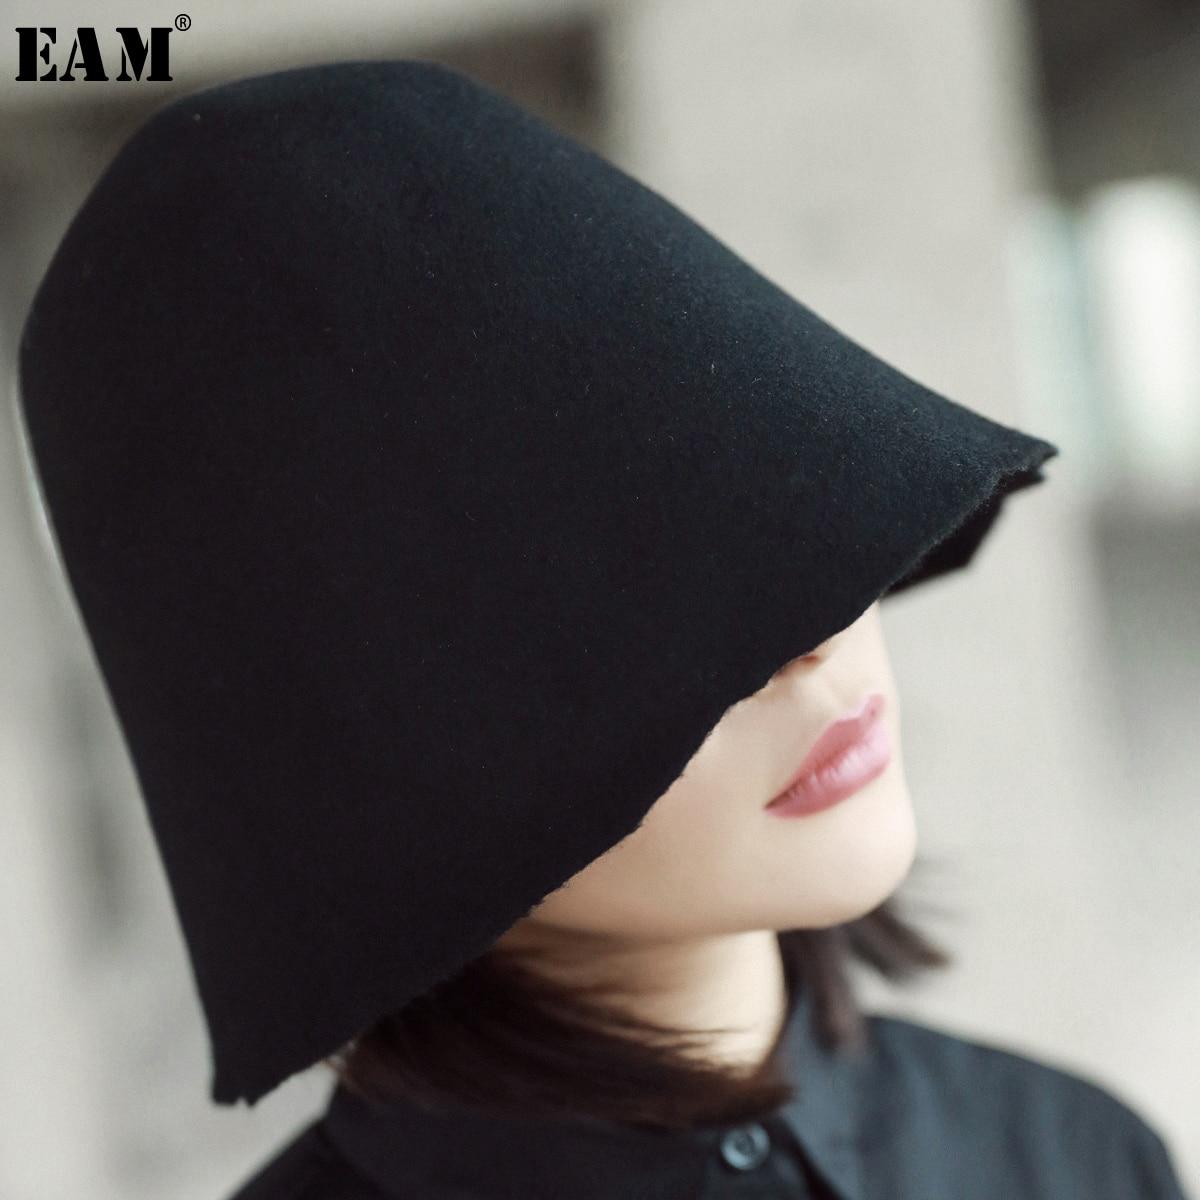 [EAM] Women Black Brief Cut Style Fishermen Hat New Round Dome Temperament Fashion Tide All-match Spring Autumn 2020 AS16501